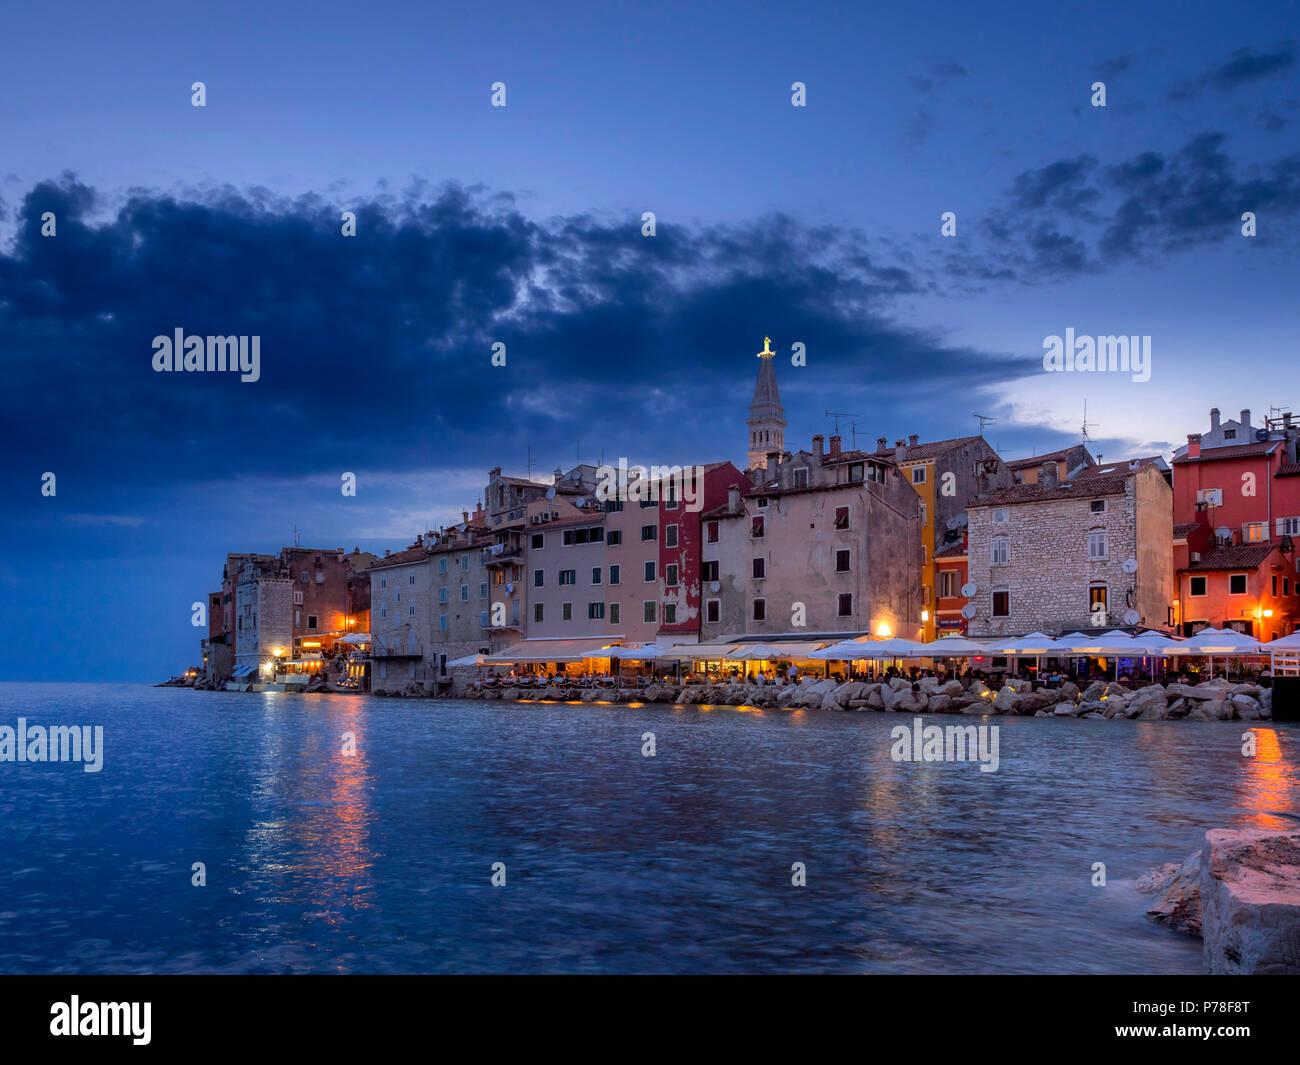 View on Rovinj at night, Istria, Croatia, Europe - Stock Image